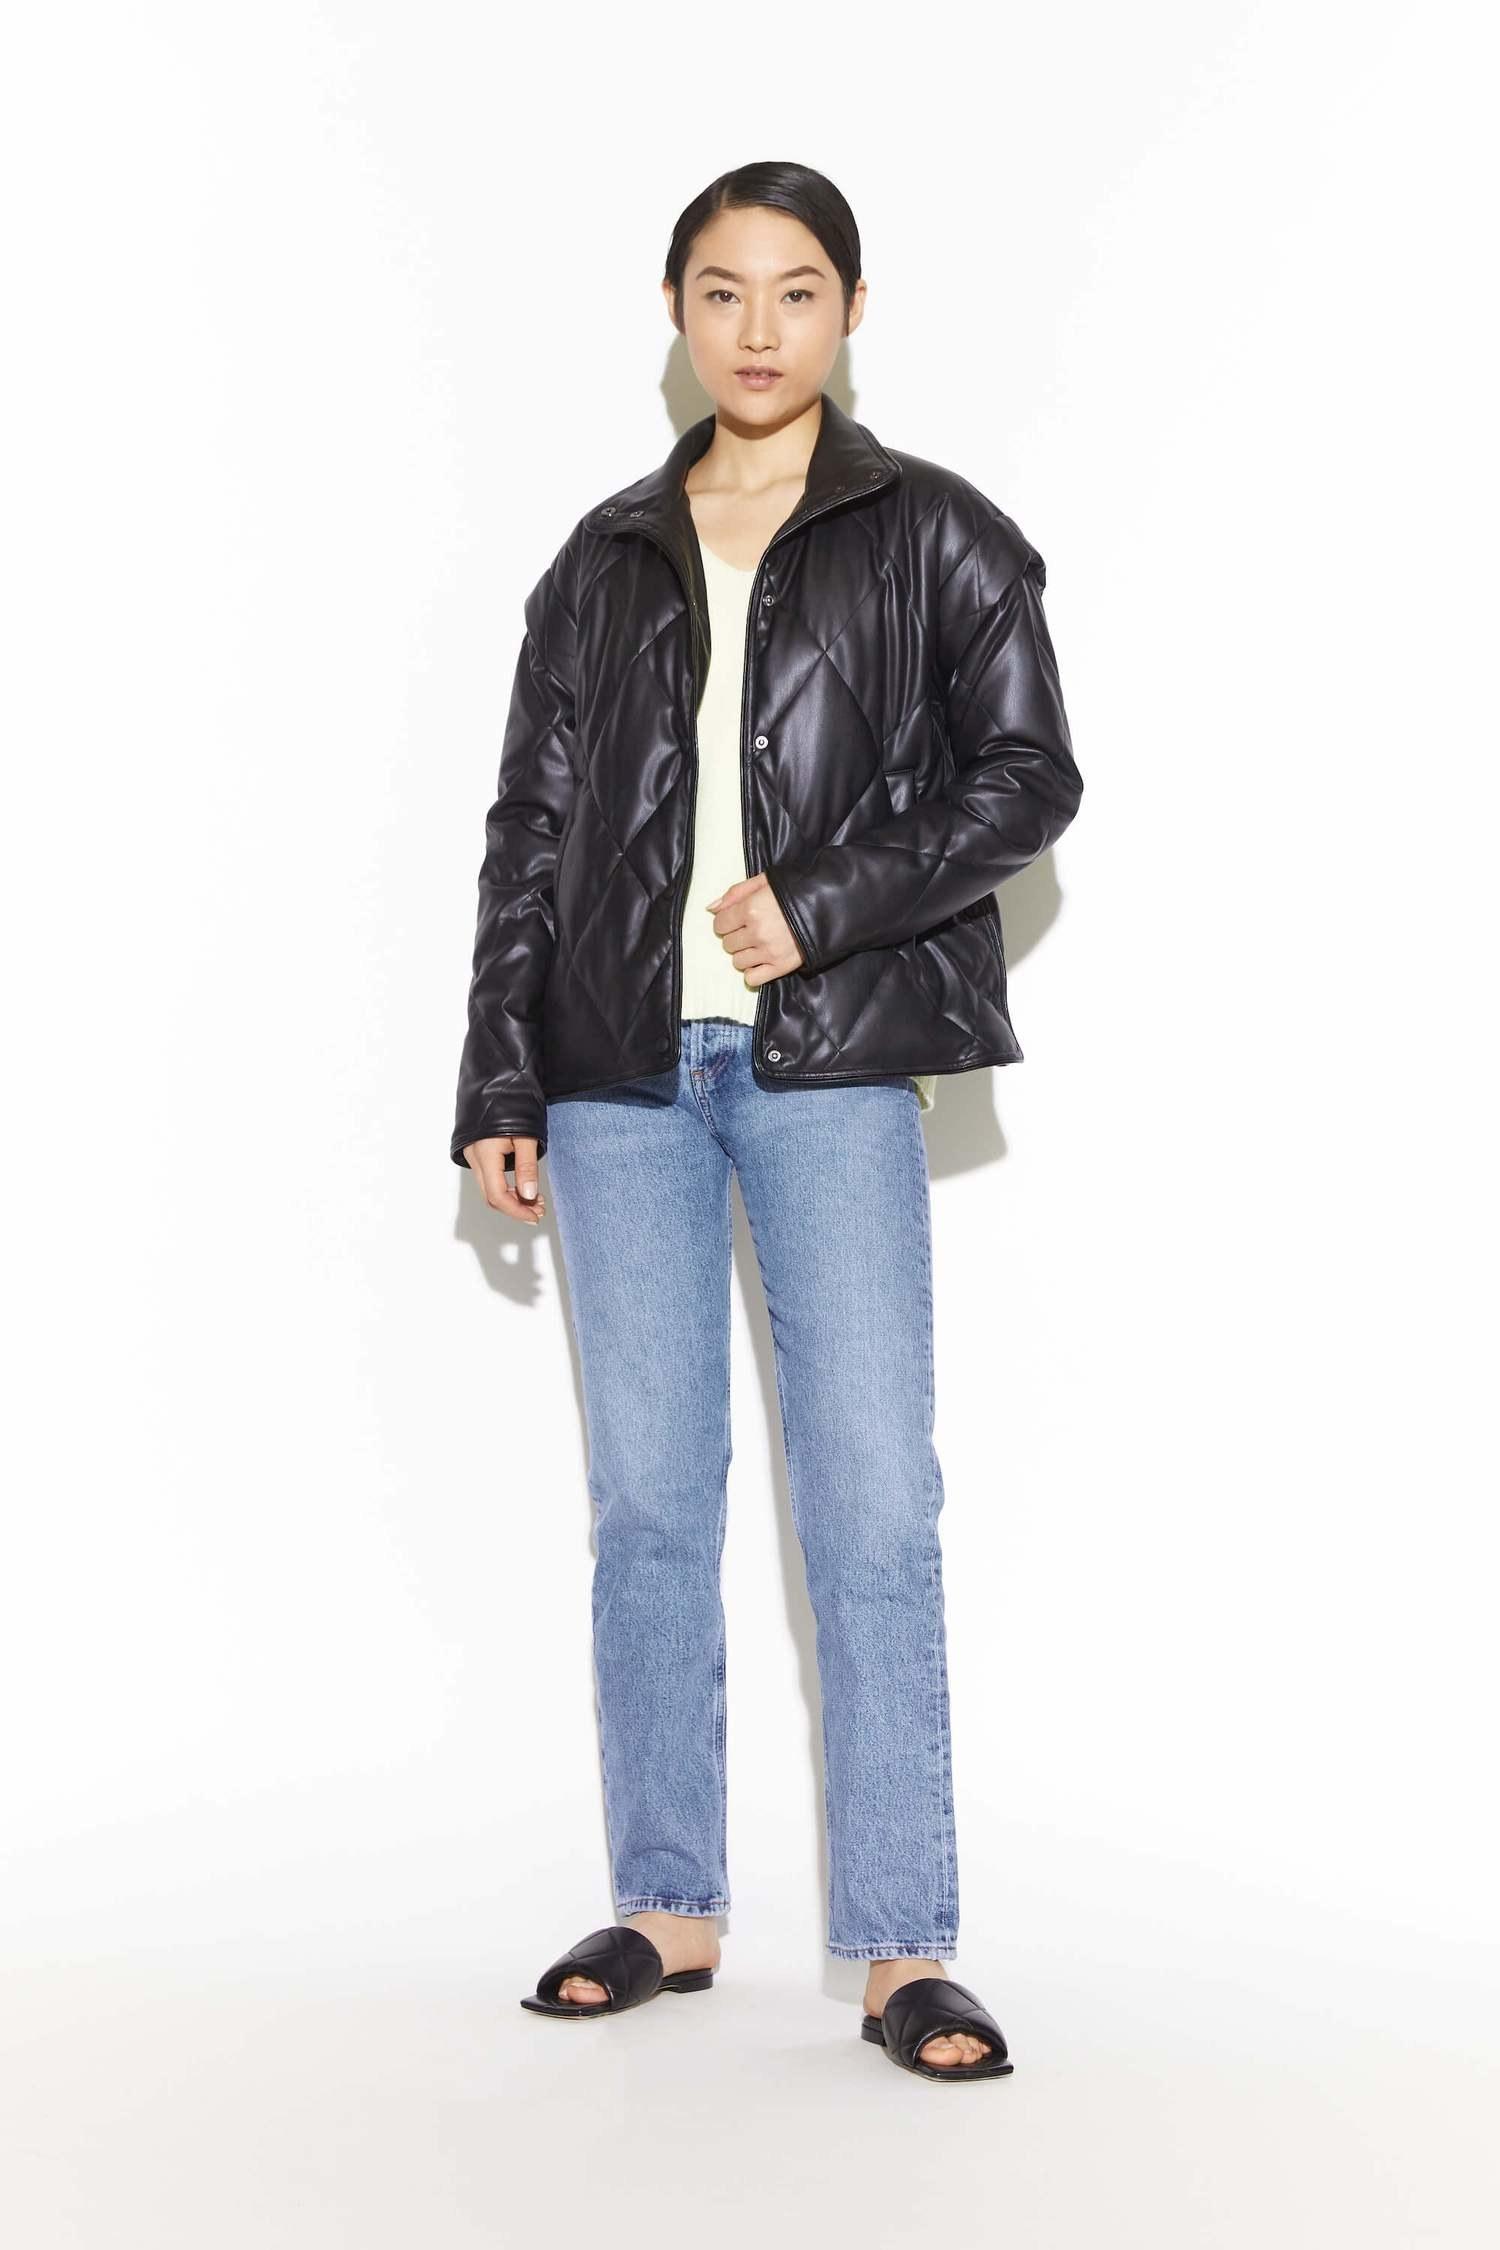 model in lightweight vegan leather puffer jacket